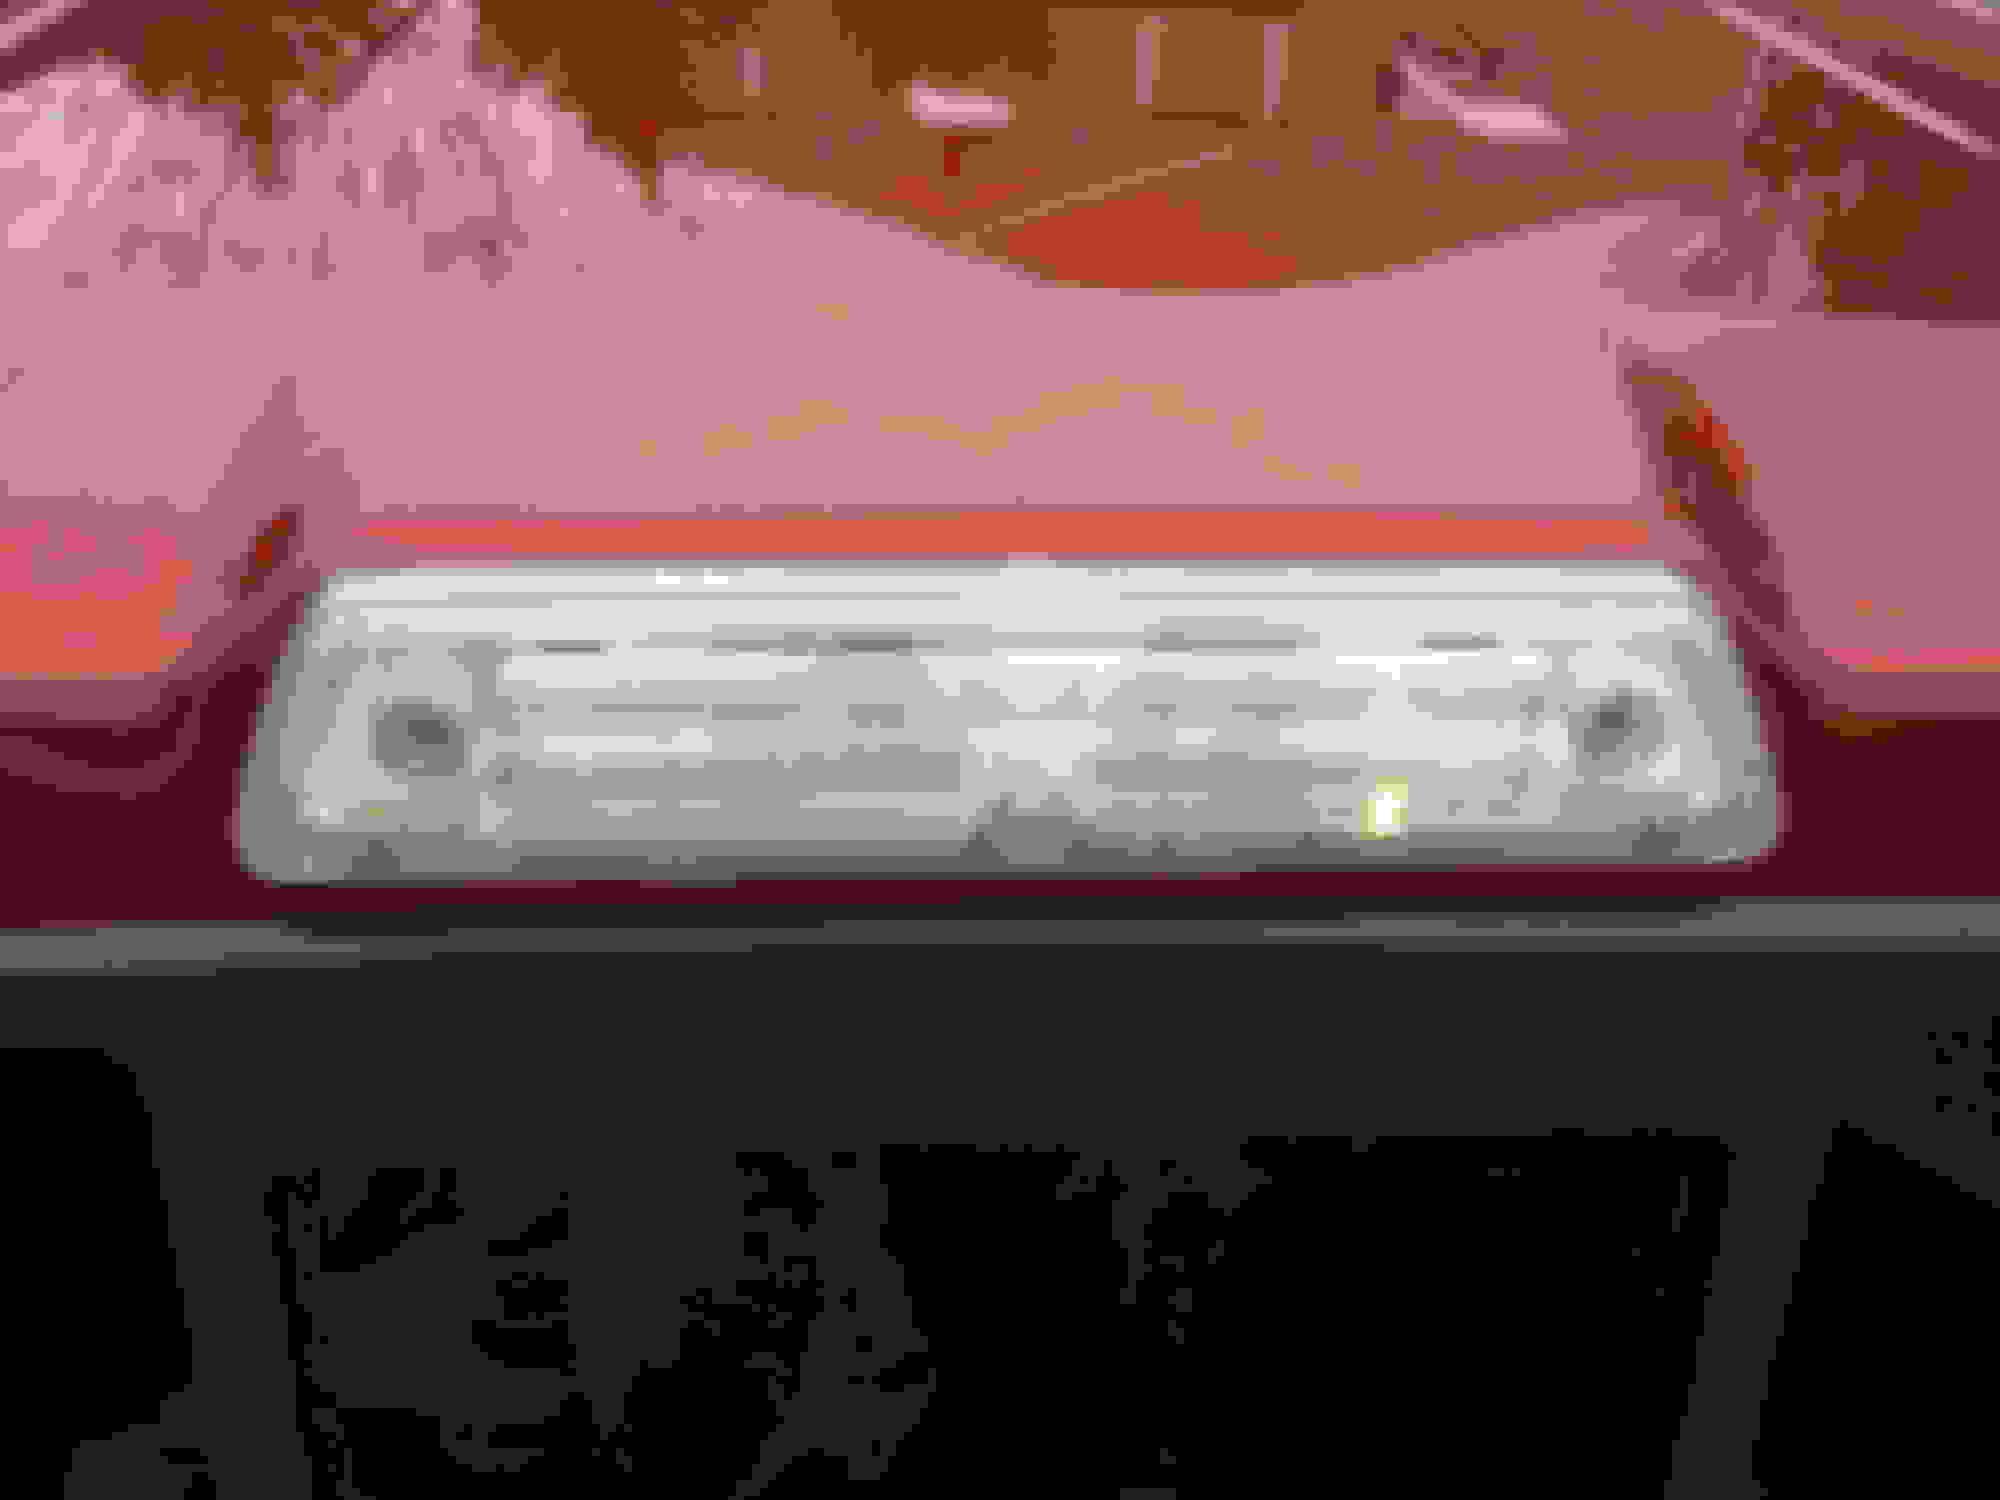 09-14 Raptor Third Brake Light How To - Ford F150 Forum